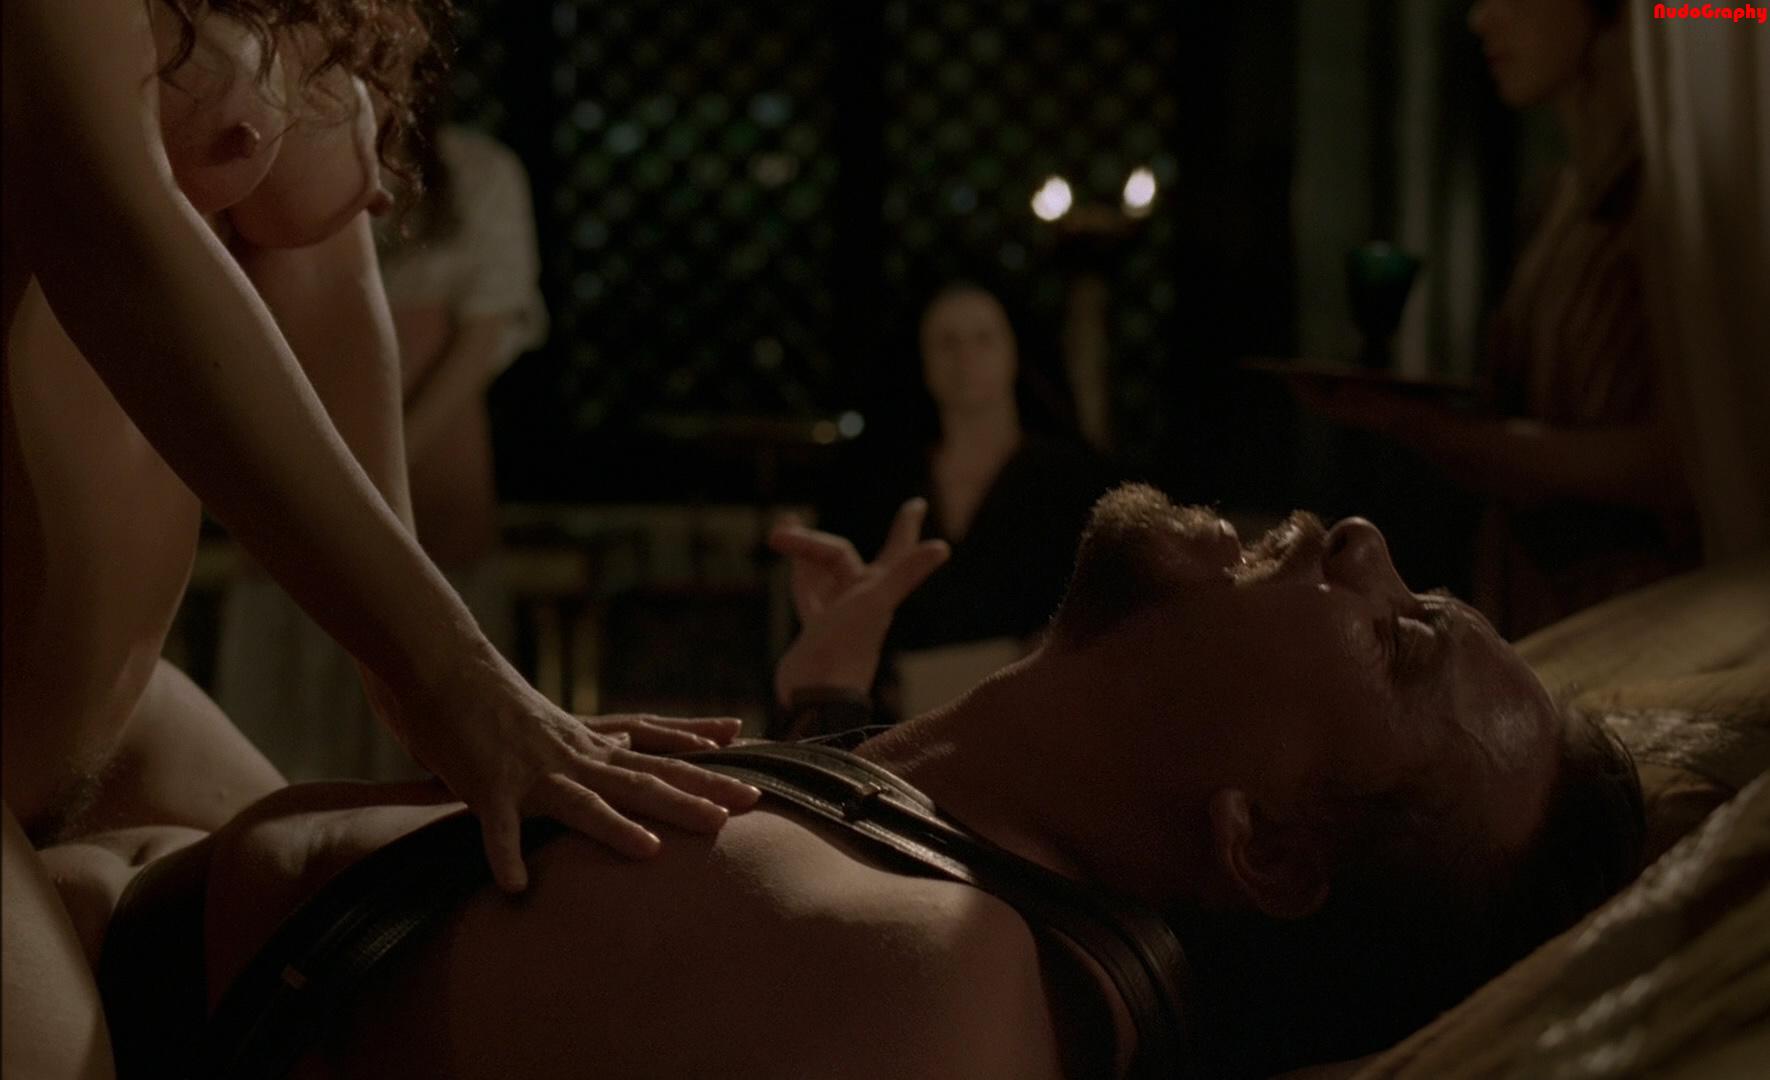 Polly walker sex scene video, amita dhiri naked